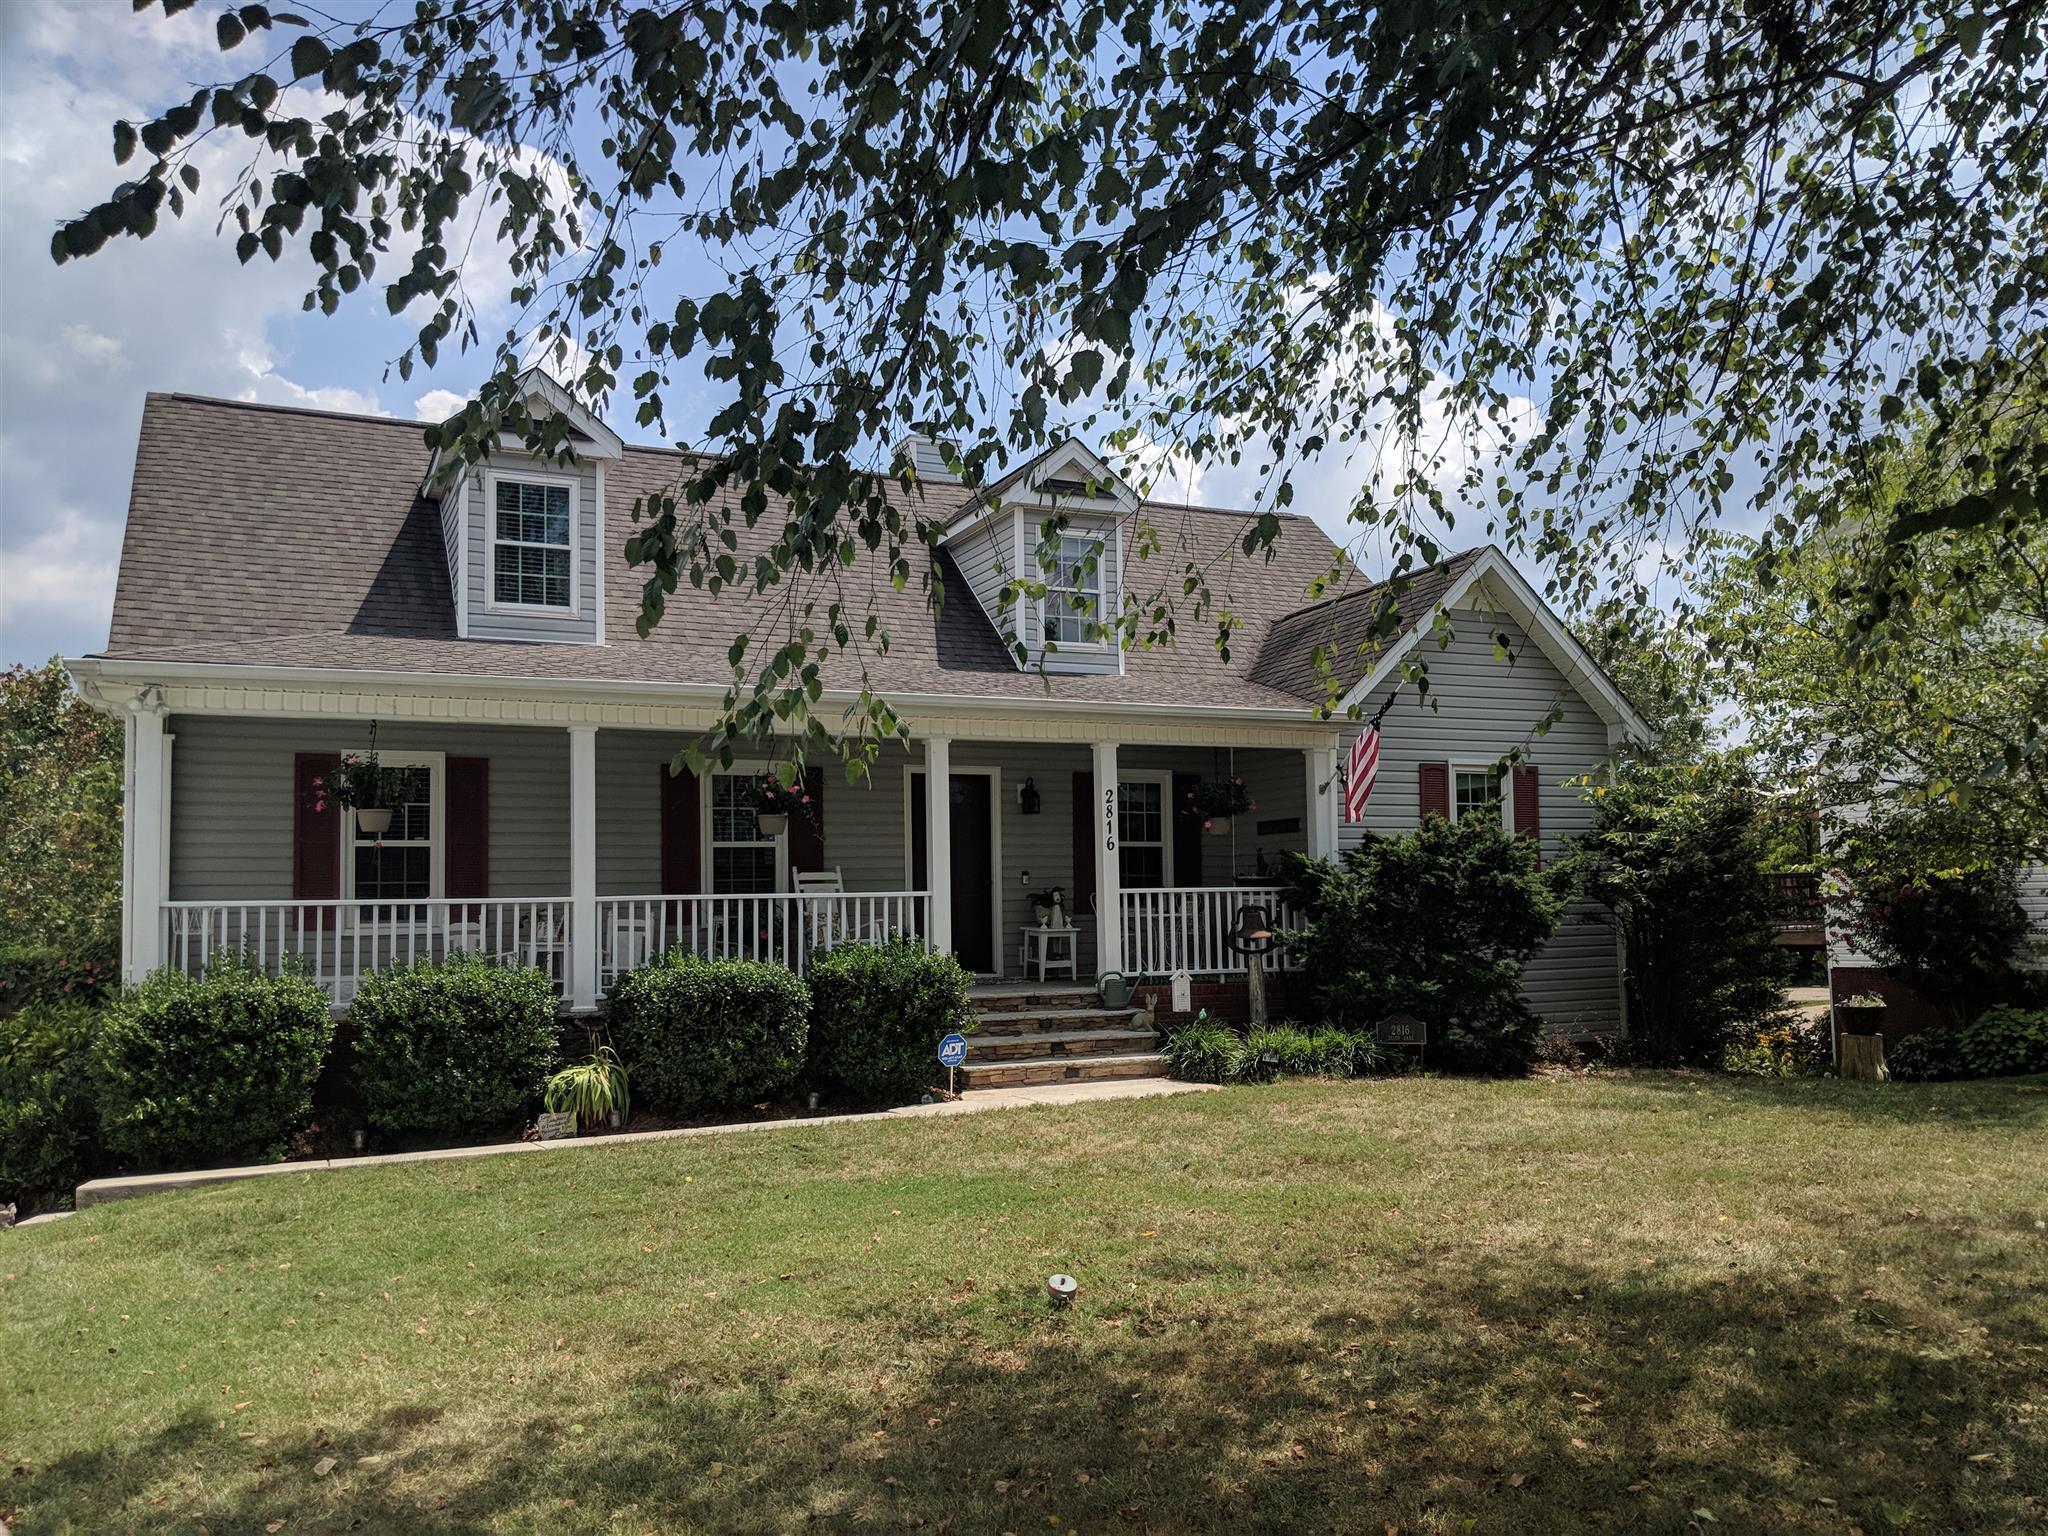 2816 Faith Ln, Spring Hill, TN 37174 - Spring Hill, TN real estate listing